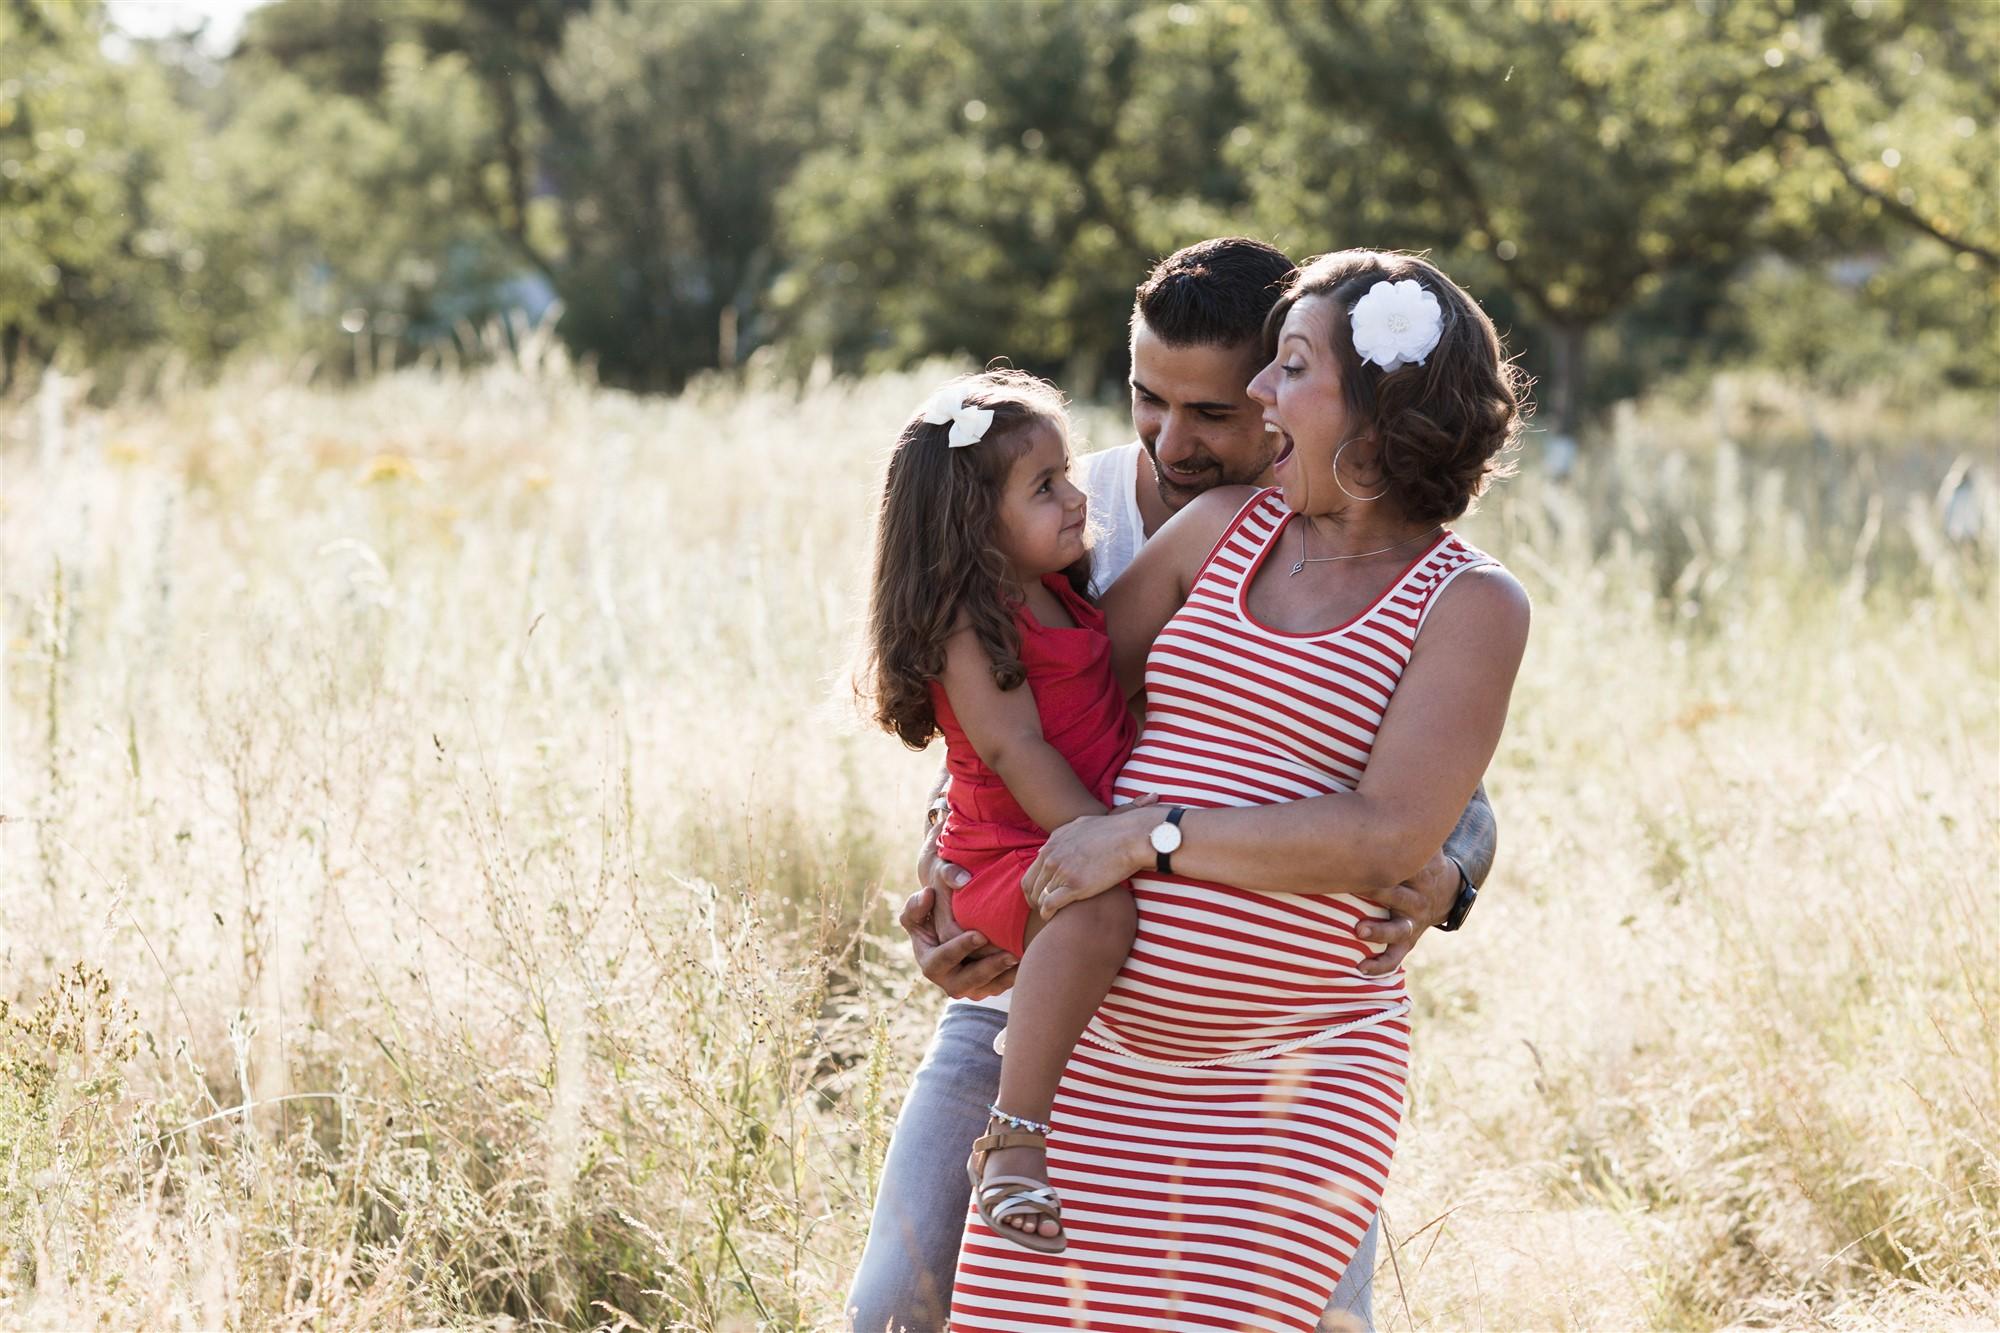 Familien Fotoshooting in der Natur